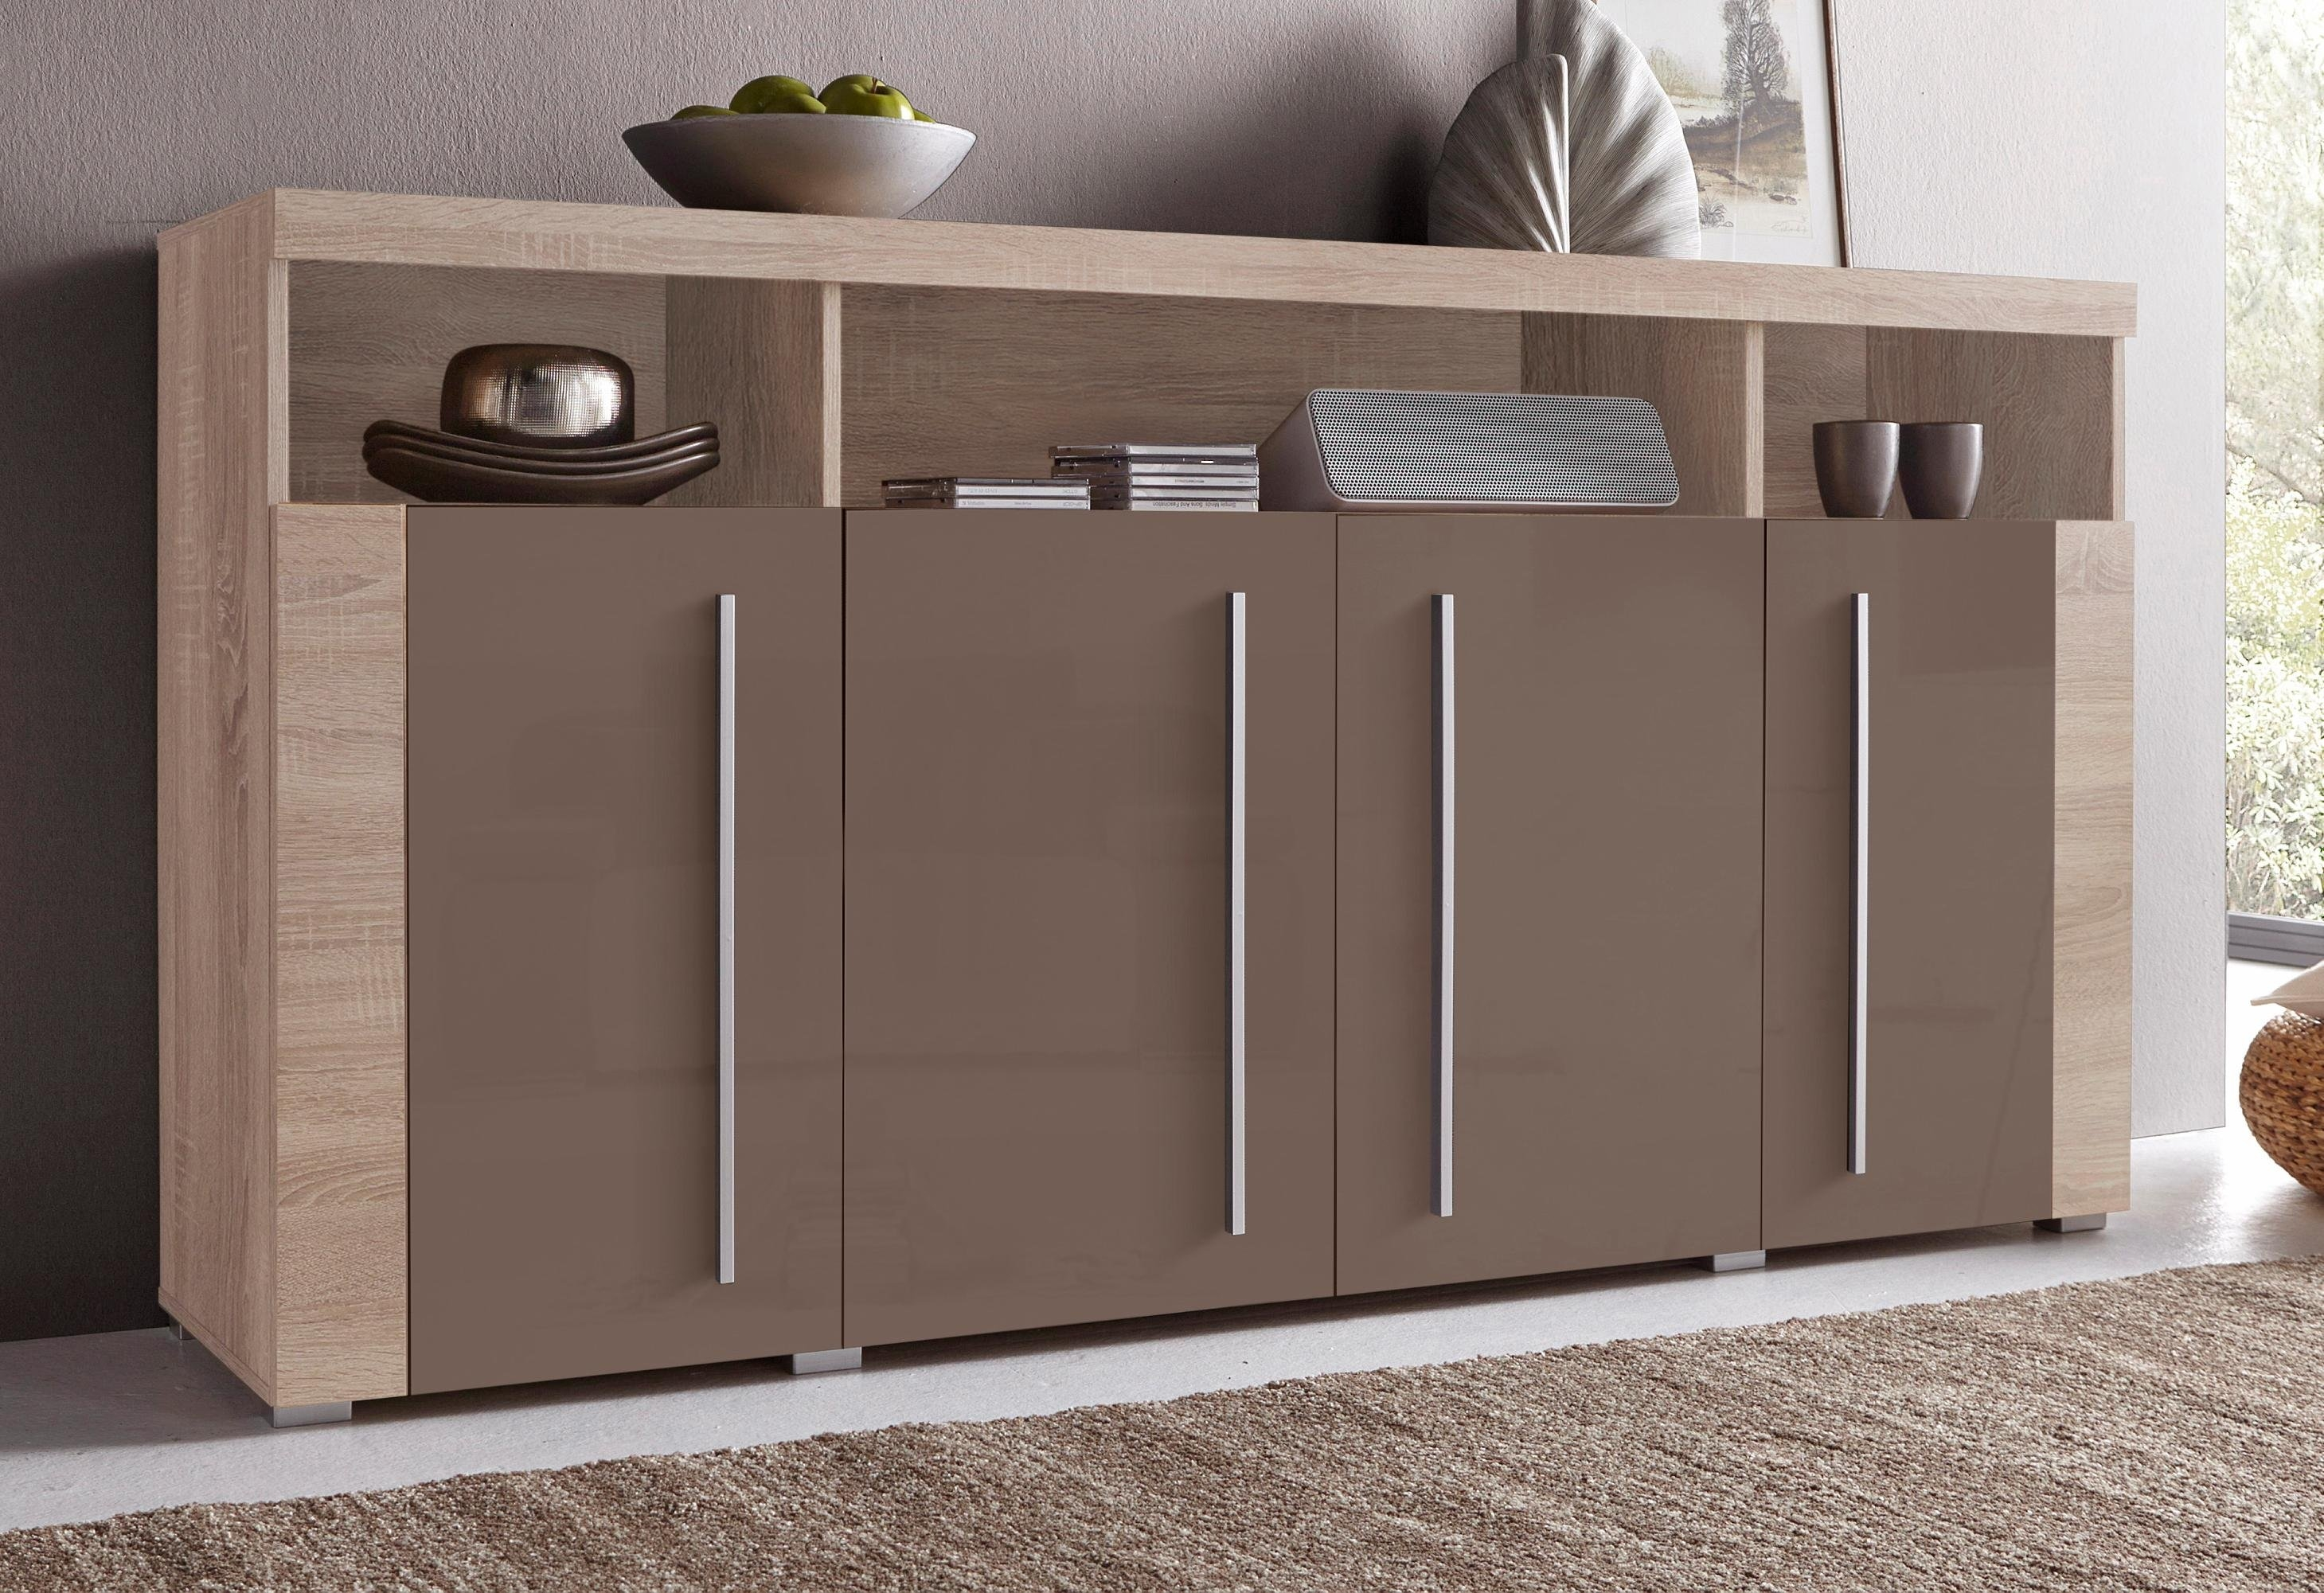 dunlopillo bevital fluid comfort amazing otto matratzen x auf kreative deko ideen oder. Black Bedroom Furniture Sets. Home Design Ideas